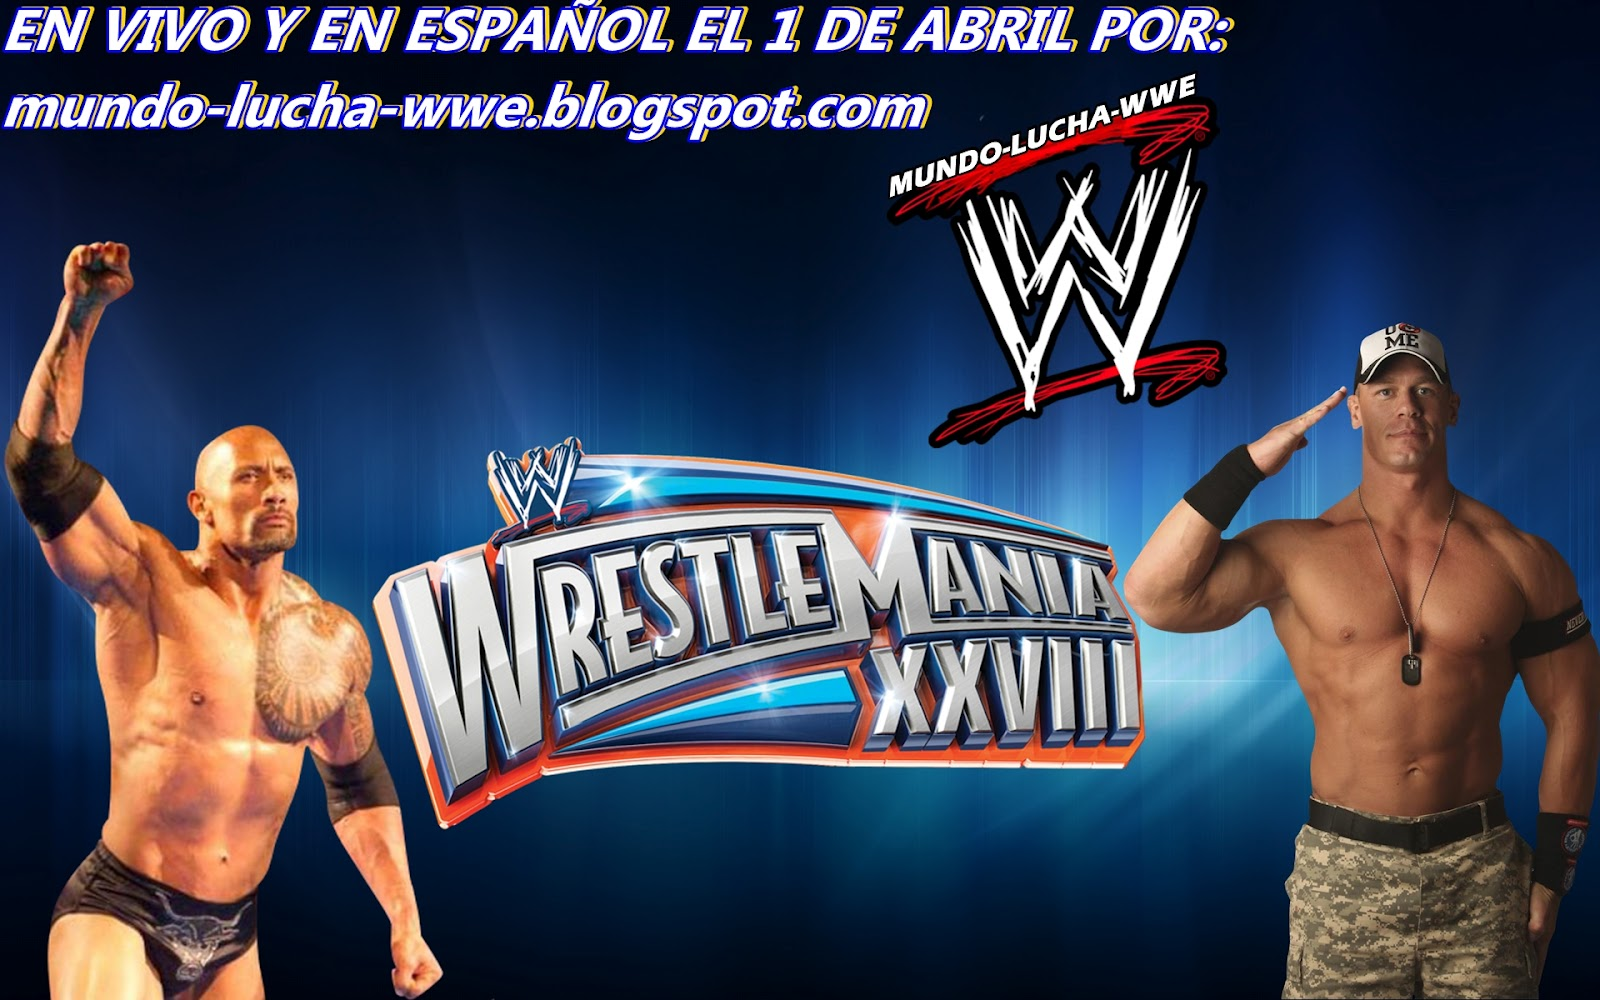 WrestleMania XXVIII28Lucha Libre ProfesionalWWEMiami 2012  Apartamentos para hospedarse en Miami